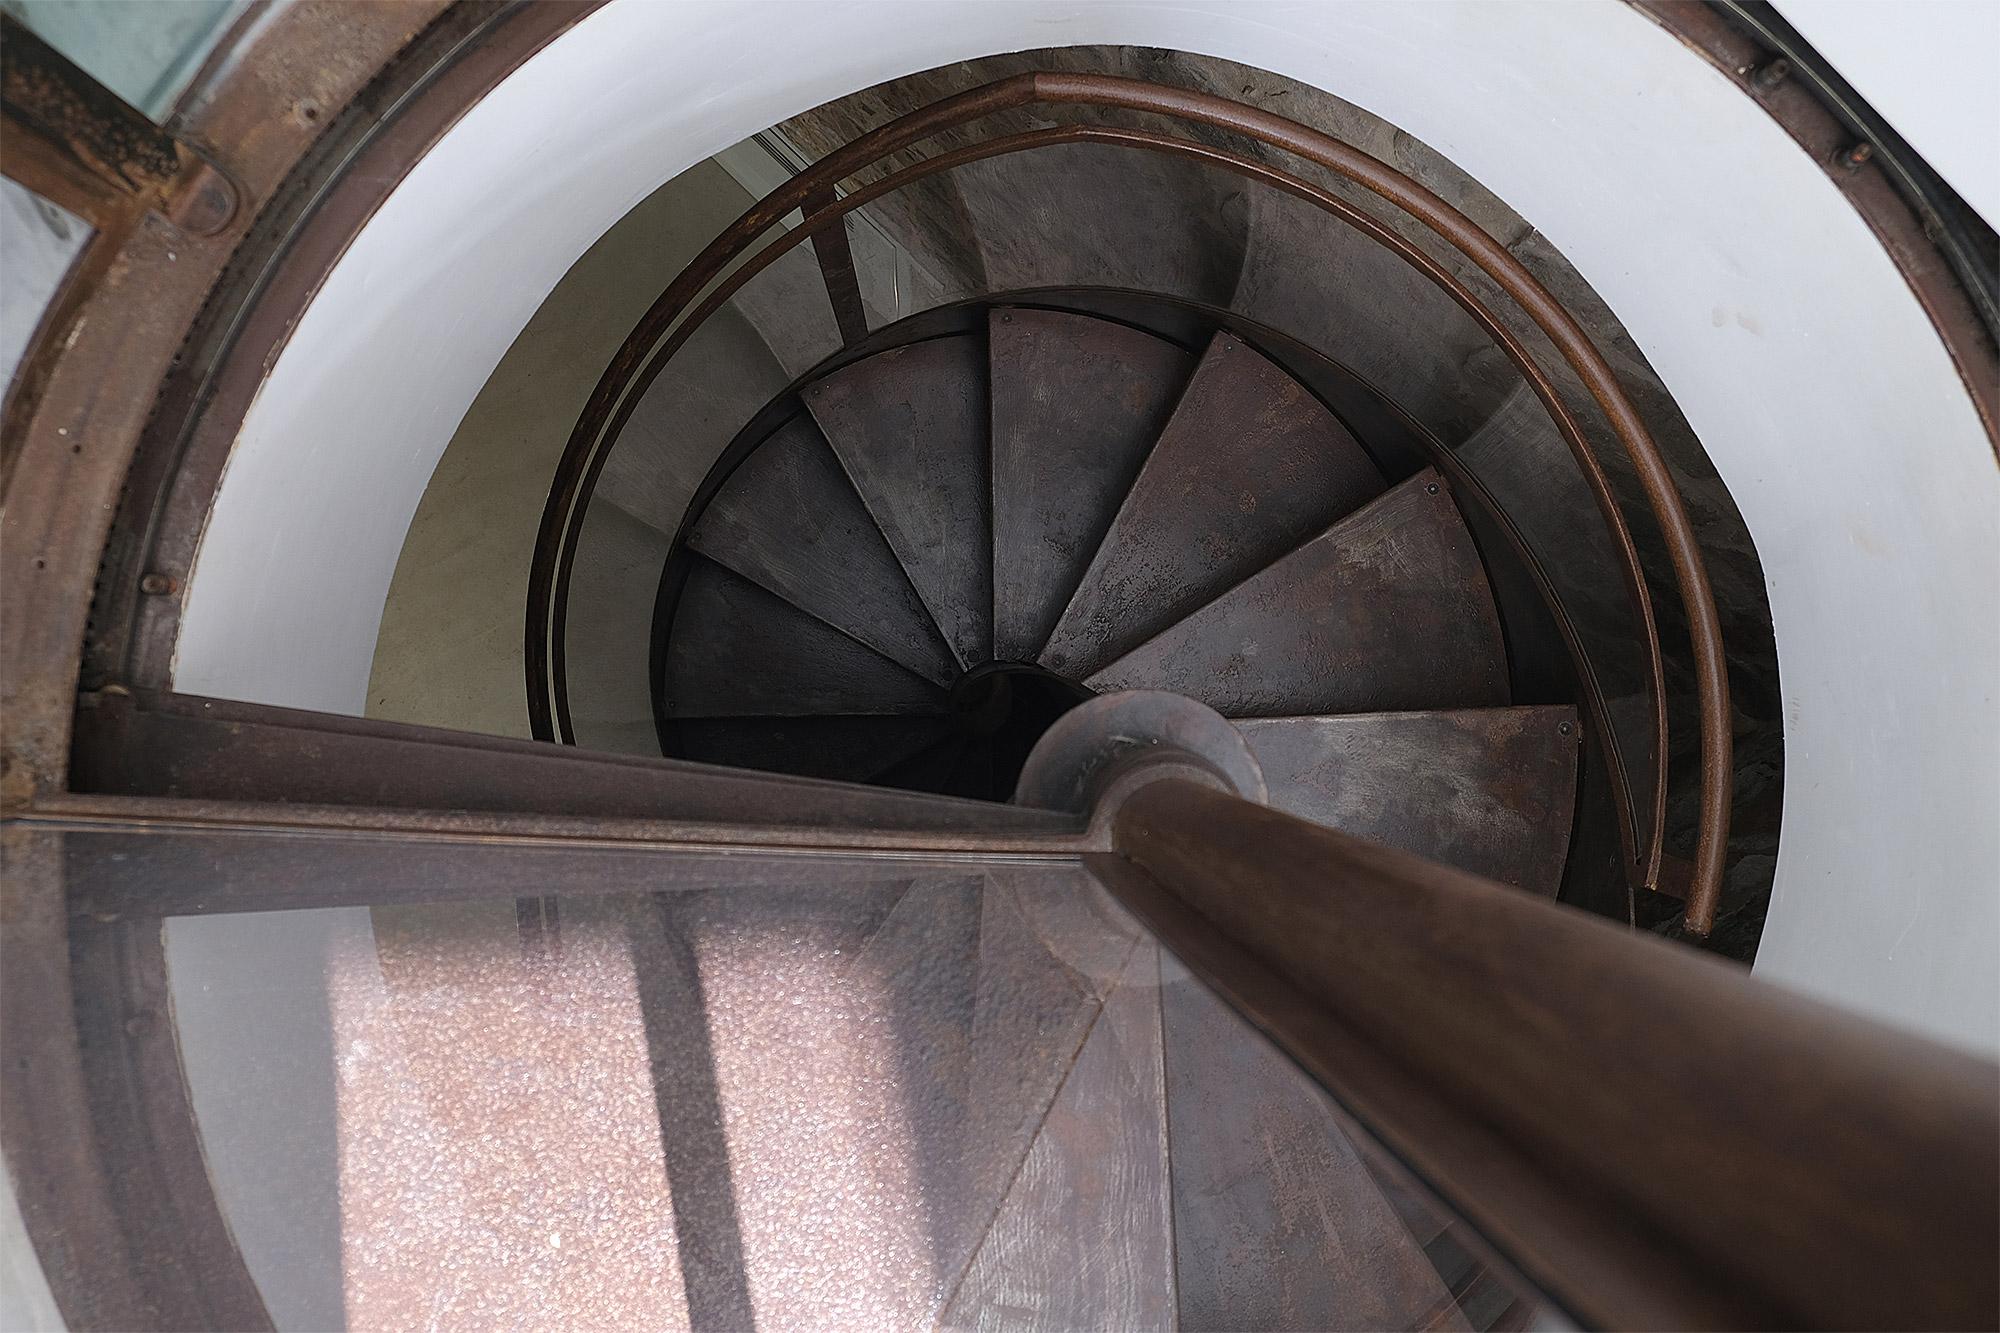 Die Wendeltreppe der Residenza Hortus